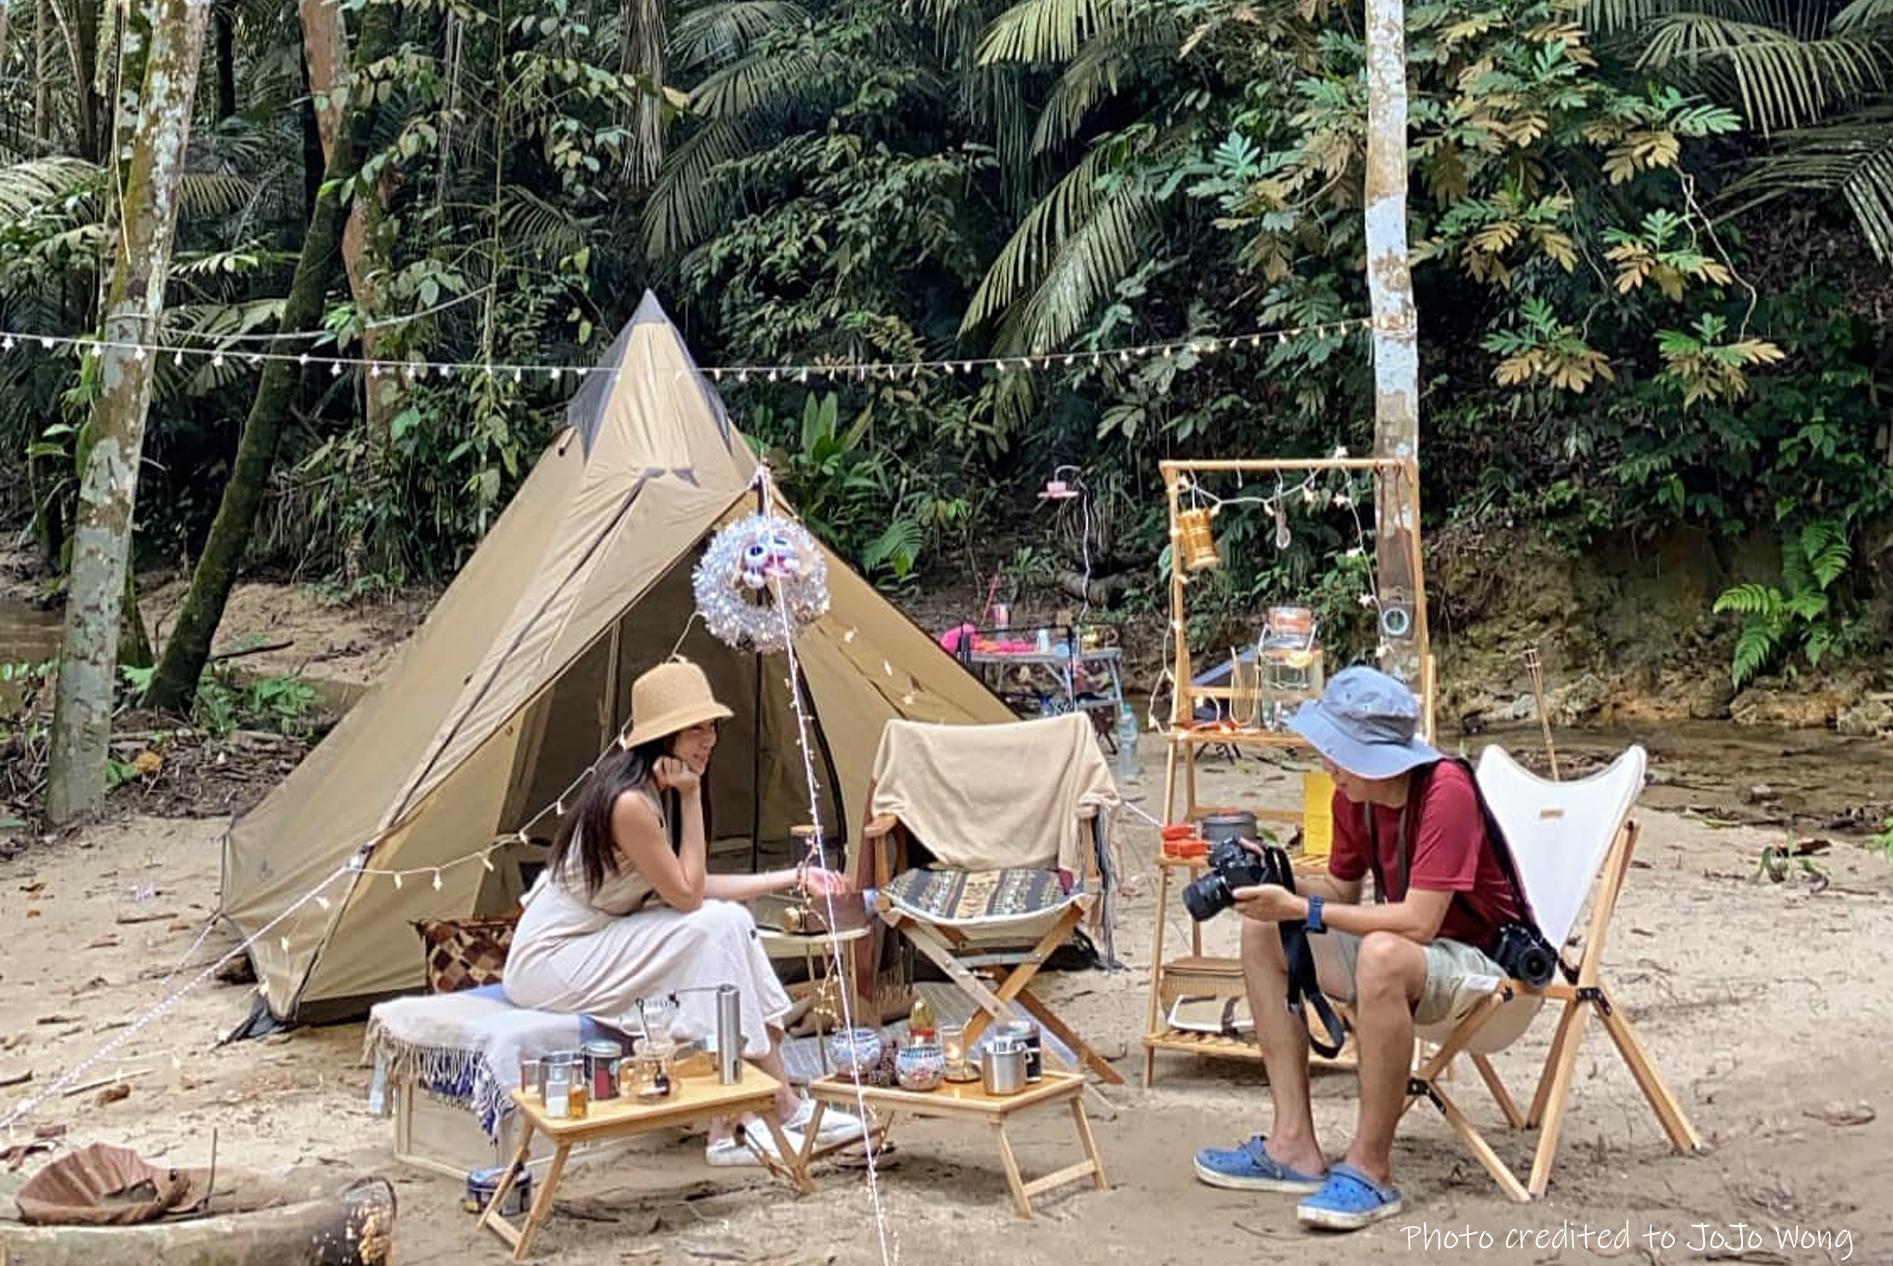 Resort_Taman_Rimba_Komanwel_Rawang_campsite_malaysia_car_camping_private_event_organizer-19